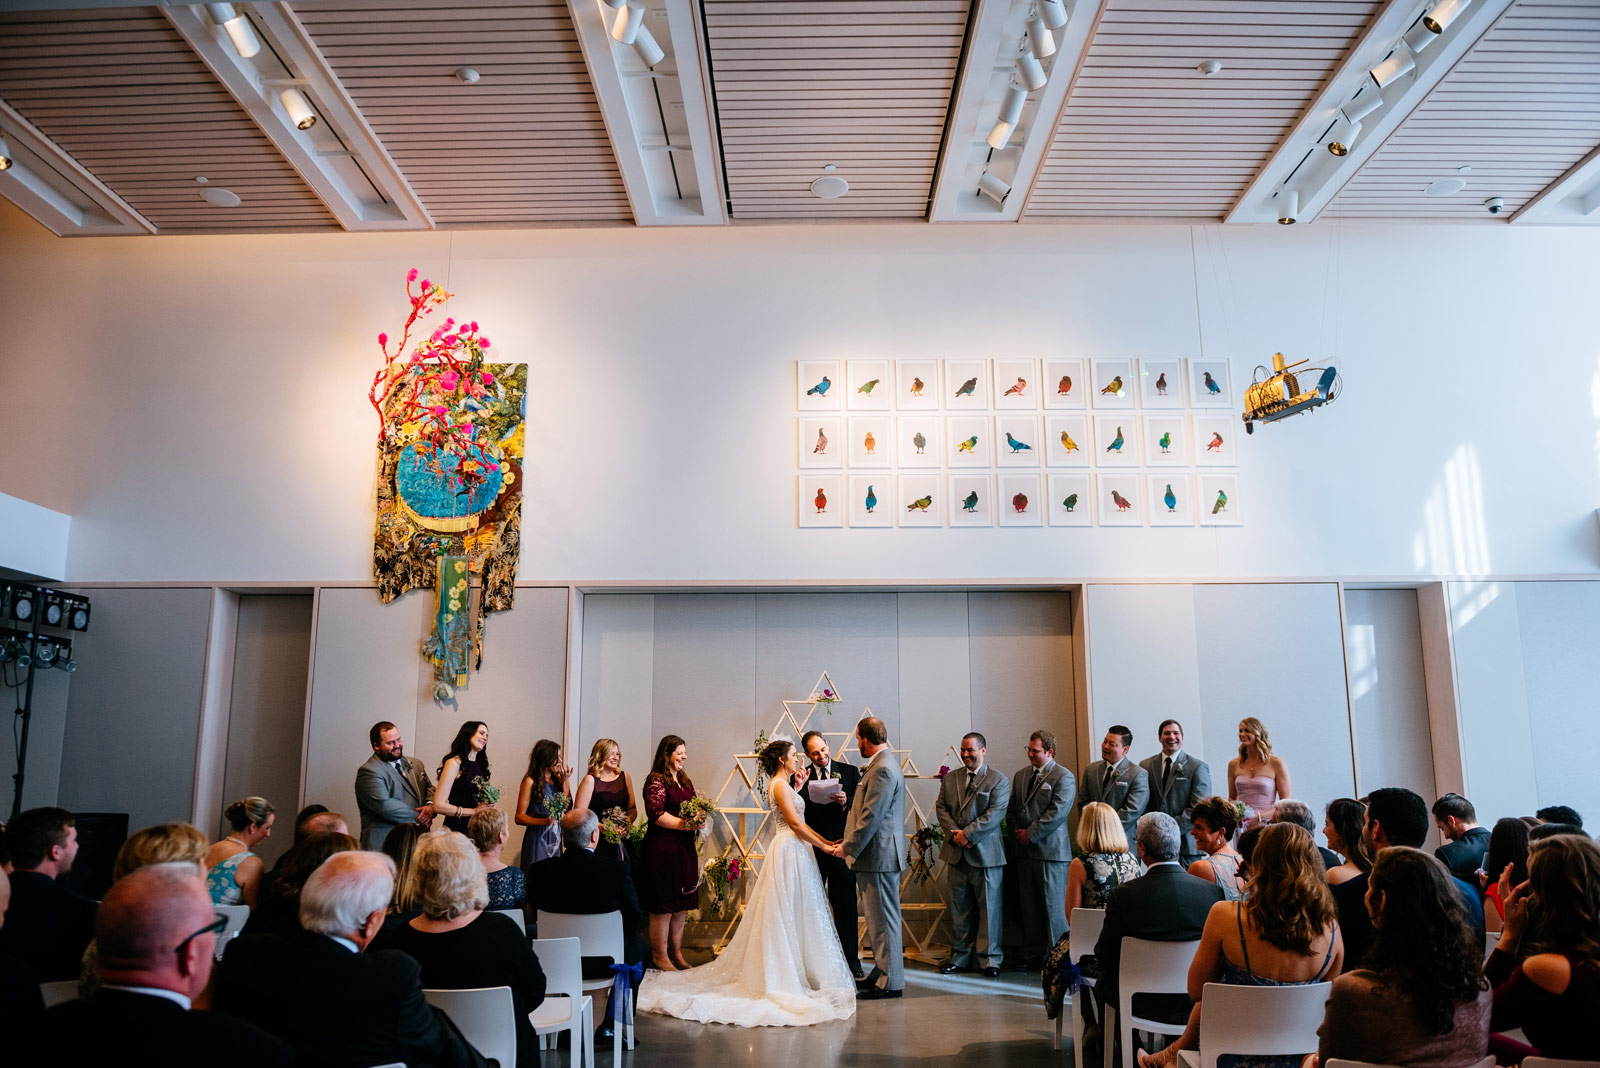 21c museum hotel wedding lexington